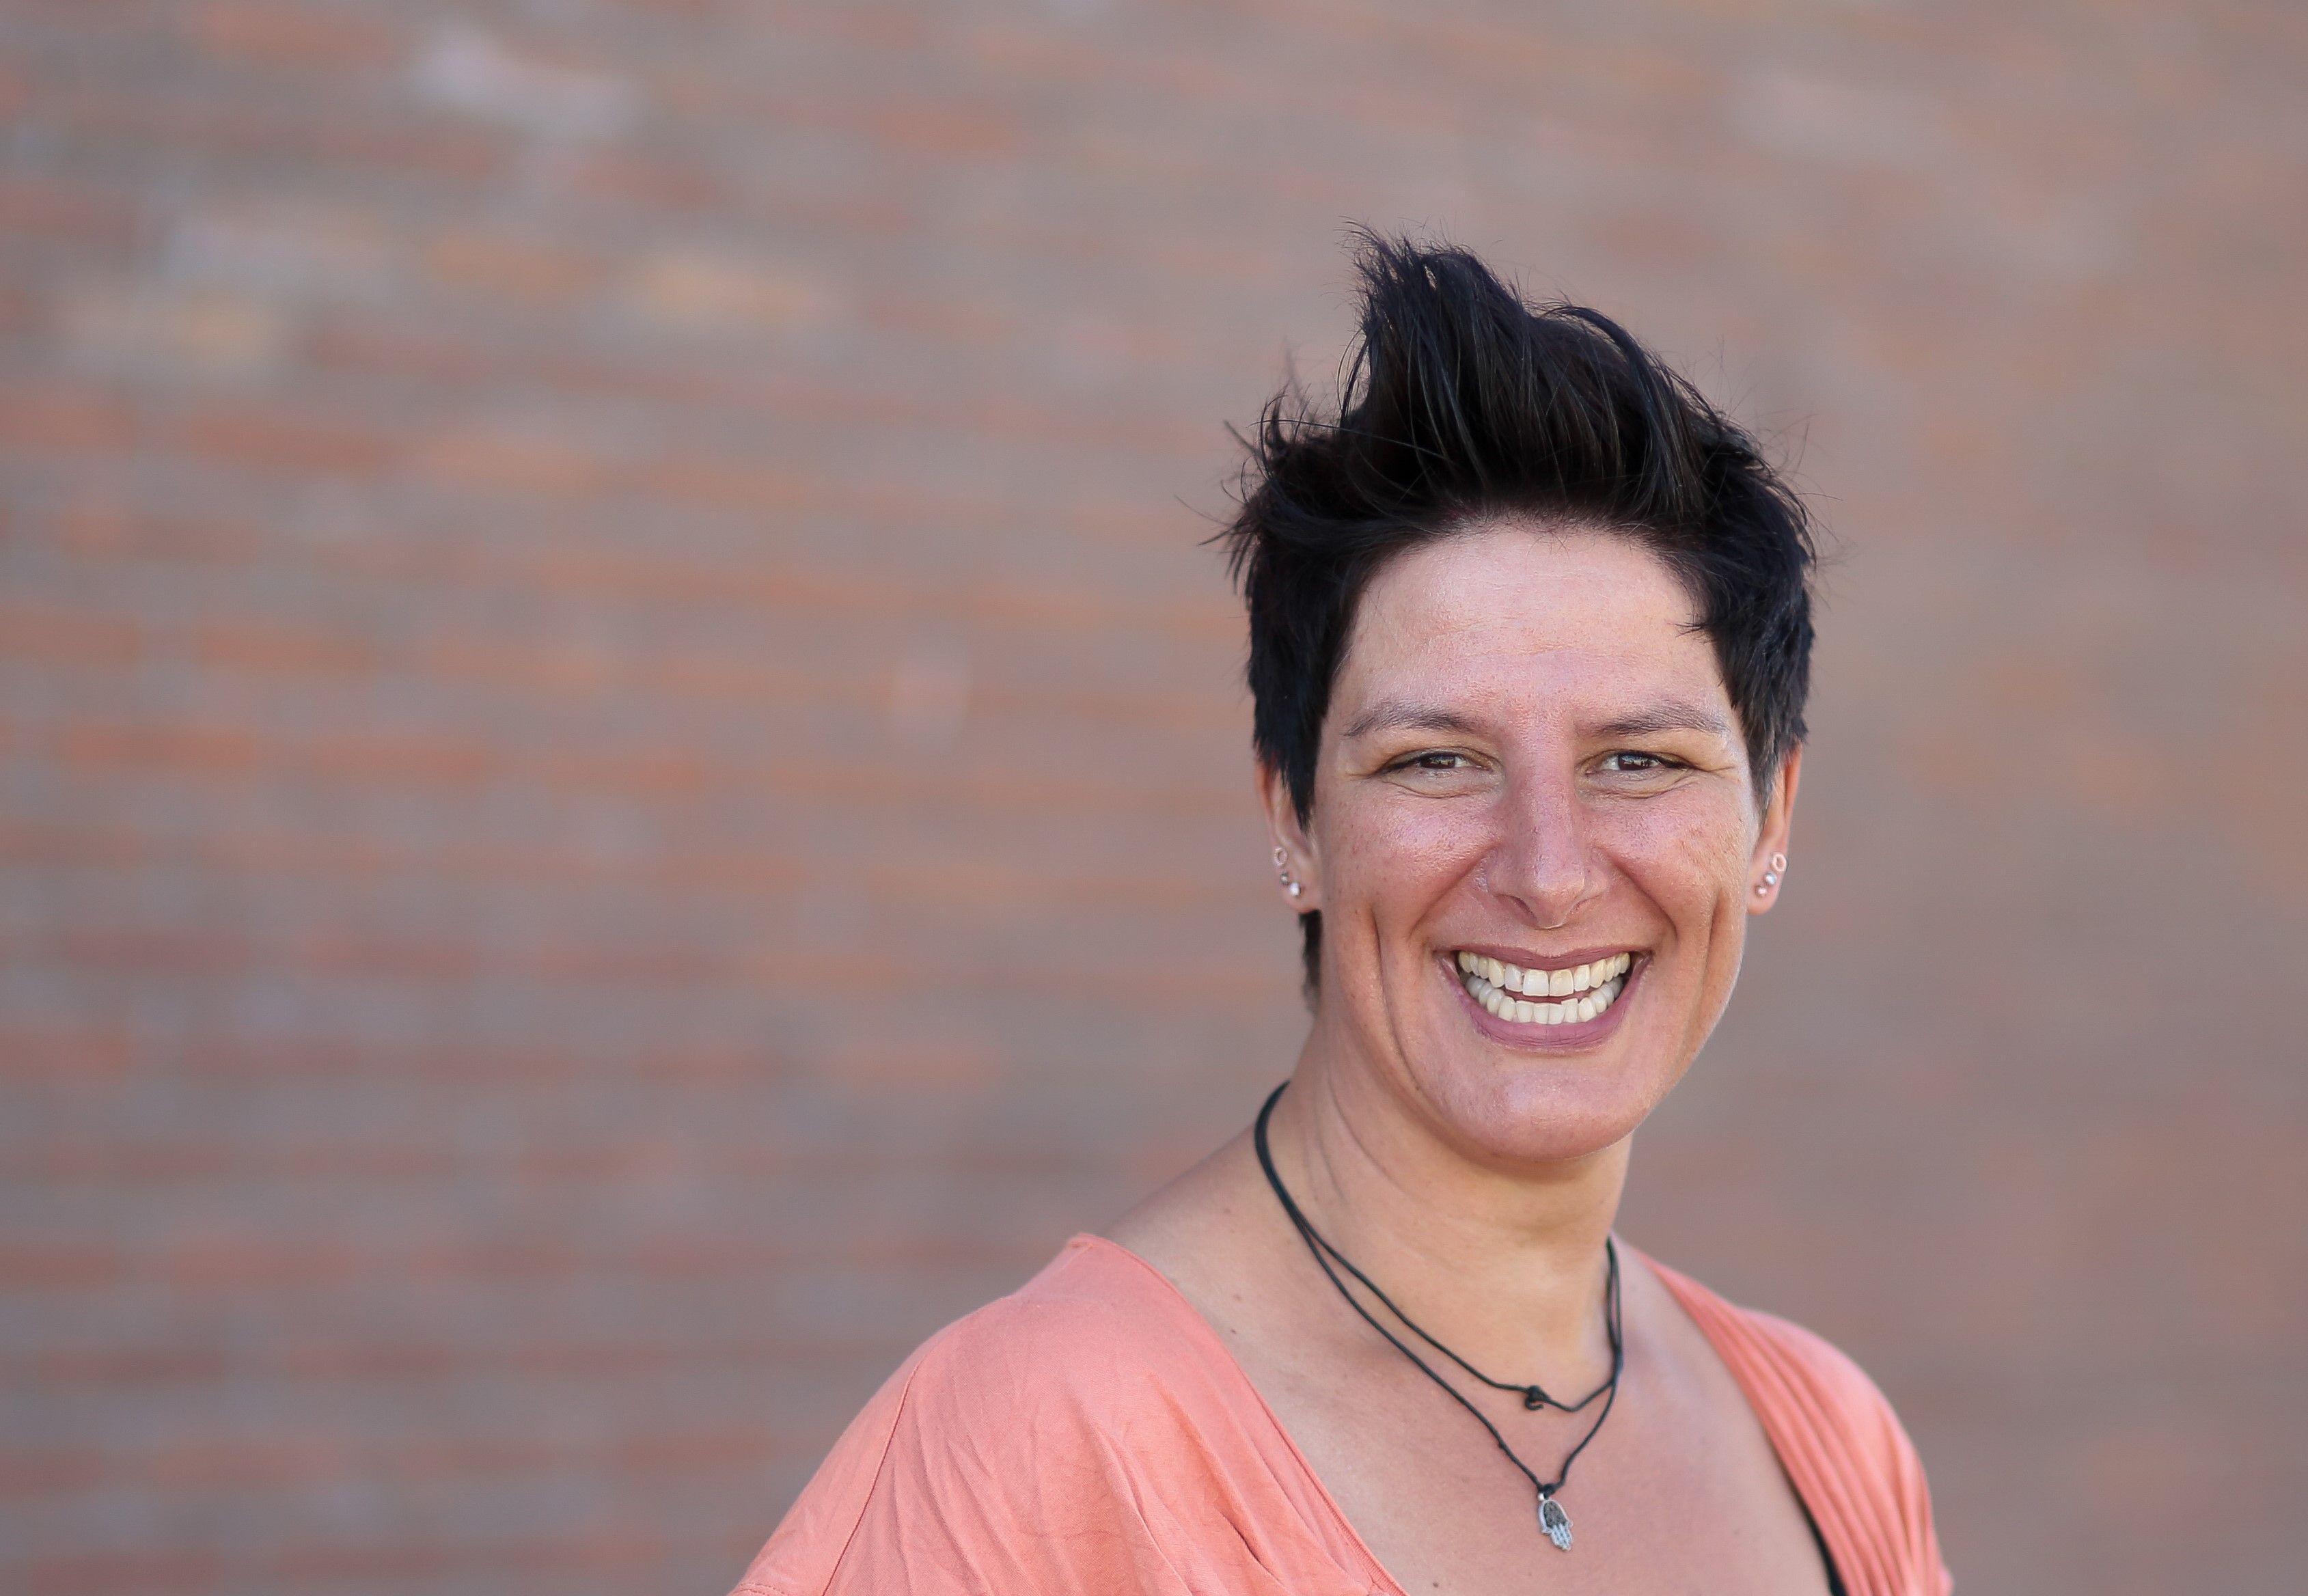 Corina is vrijwilliger bij Delft Fringe Festival